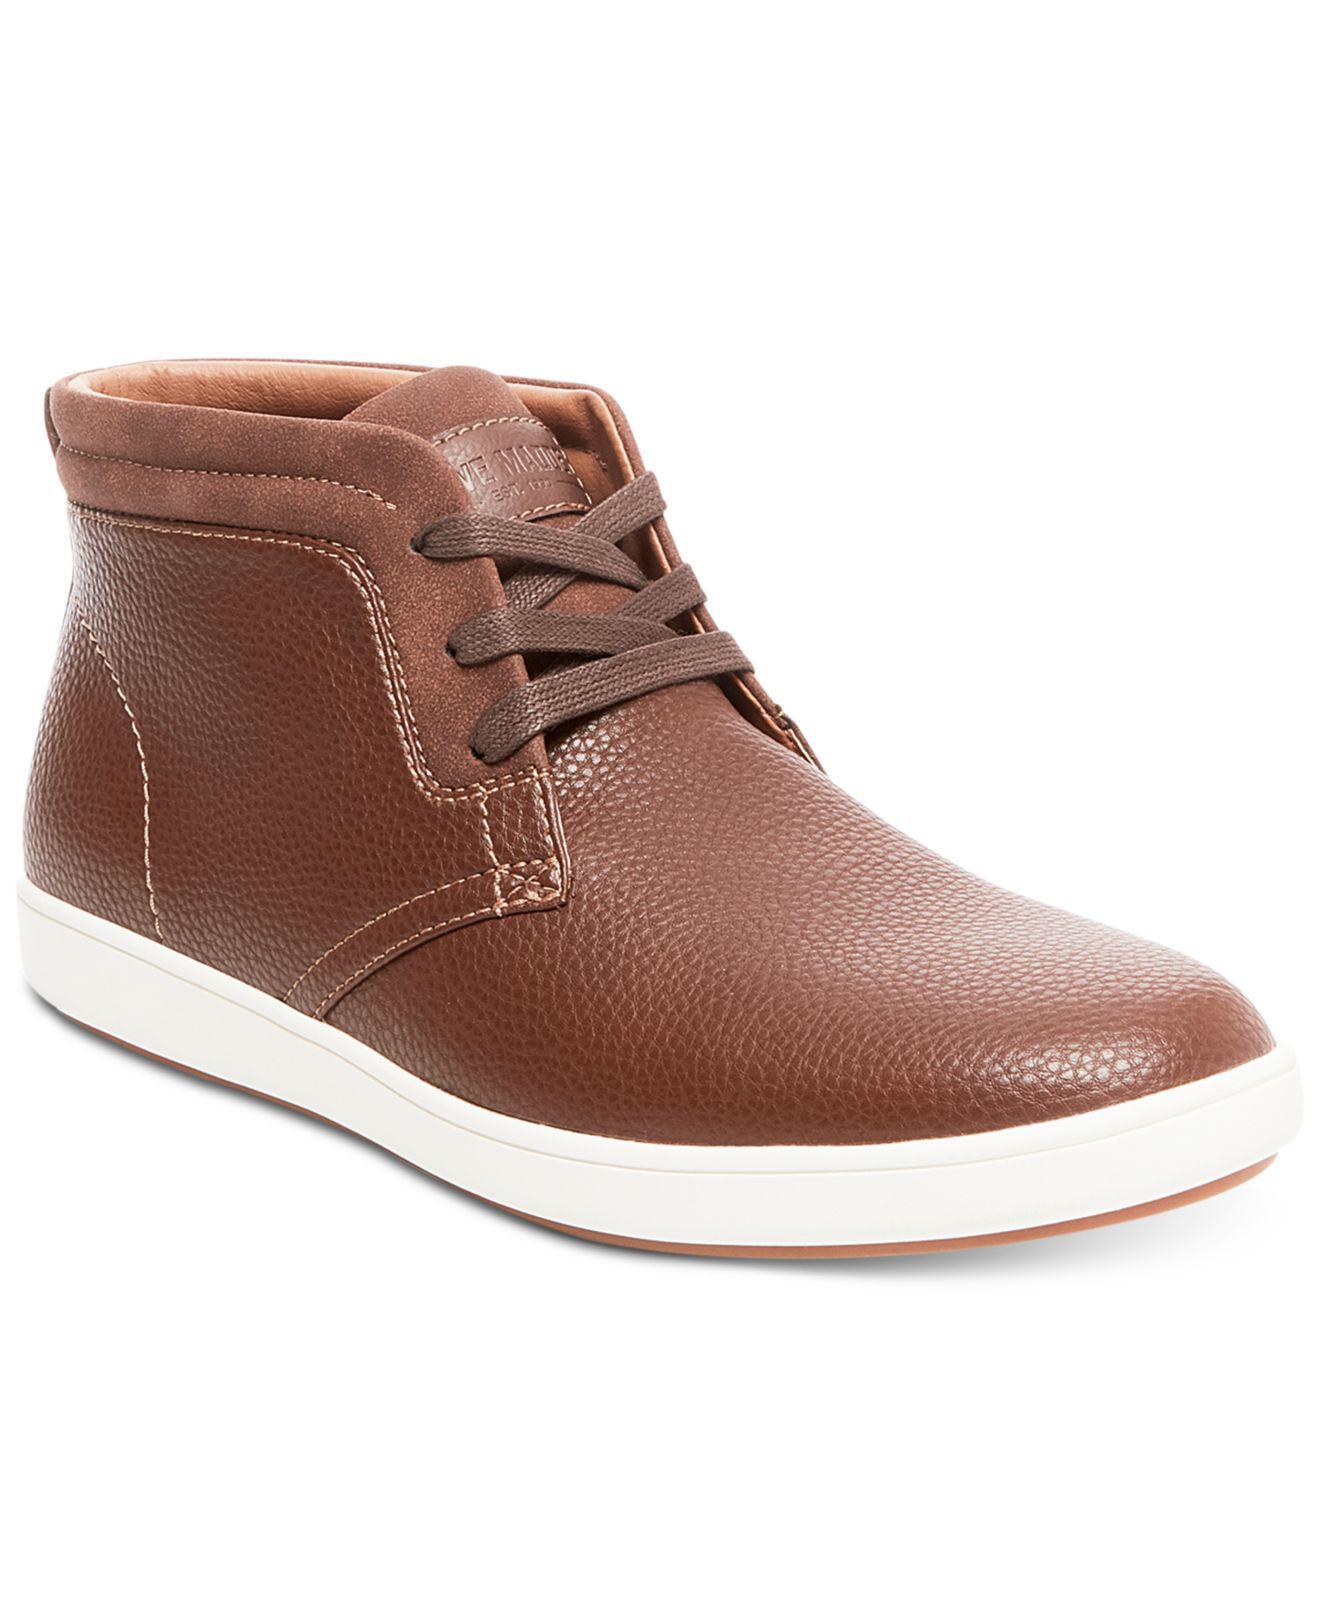 Steve Madden. Brown Men's Fairway Hi-top Sneakers